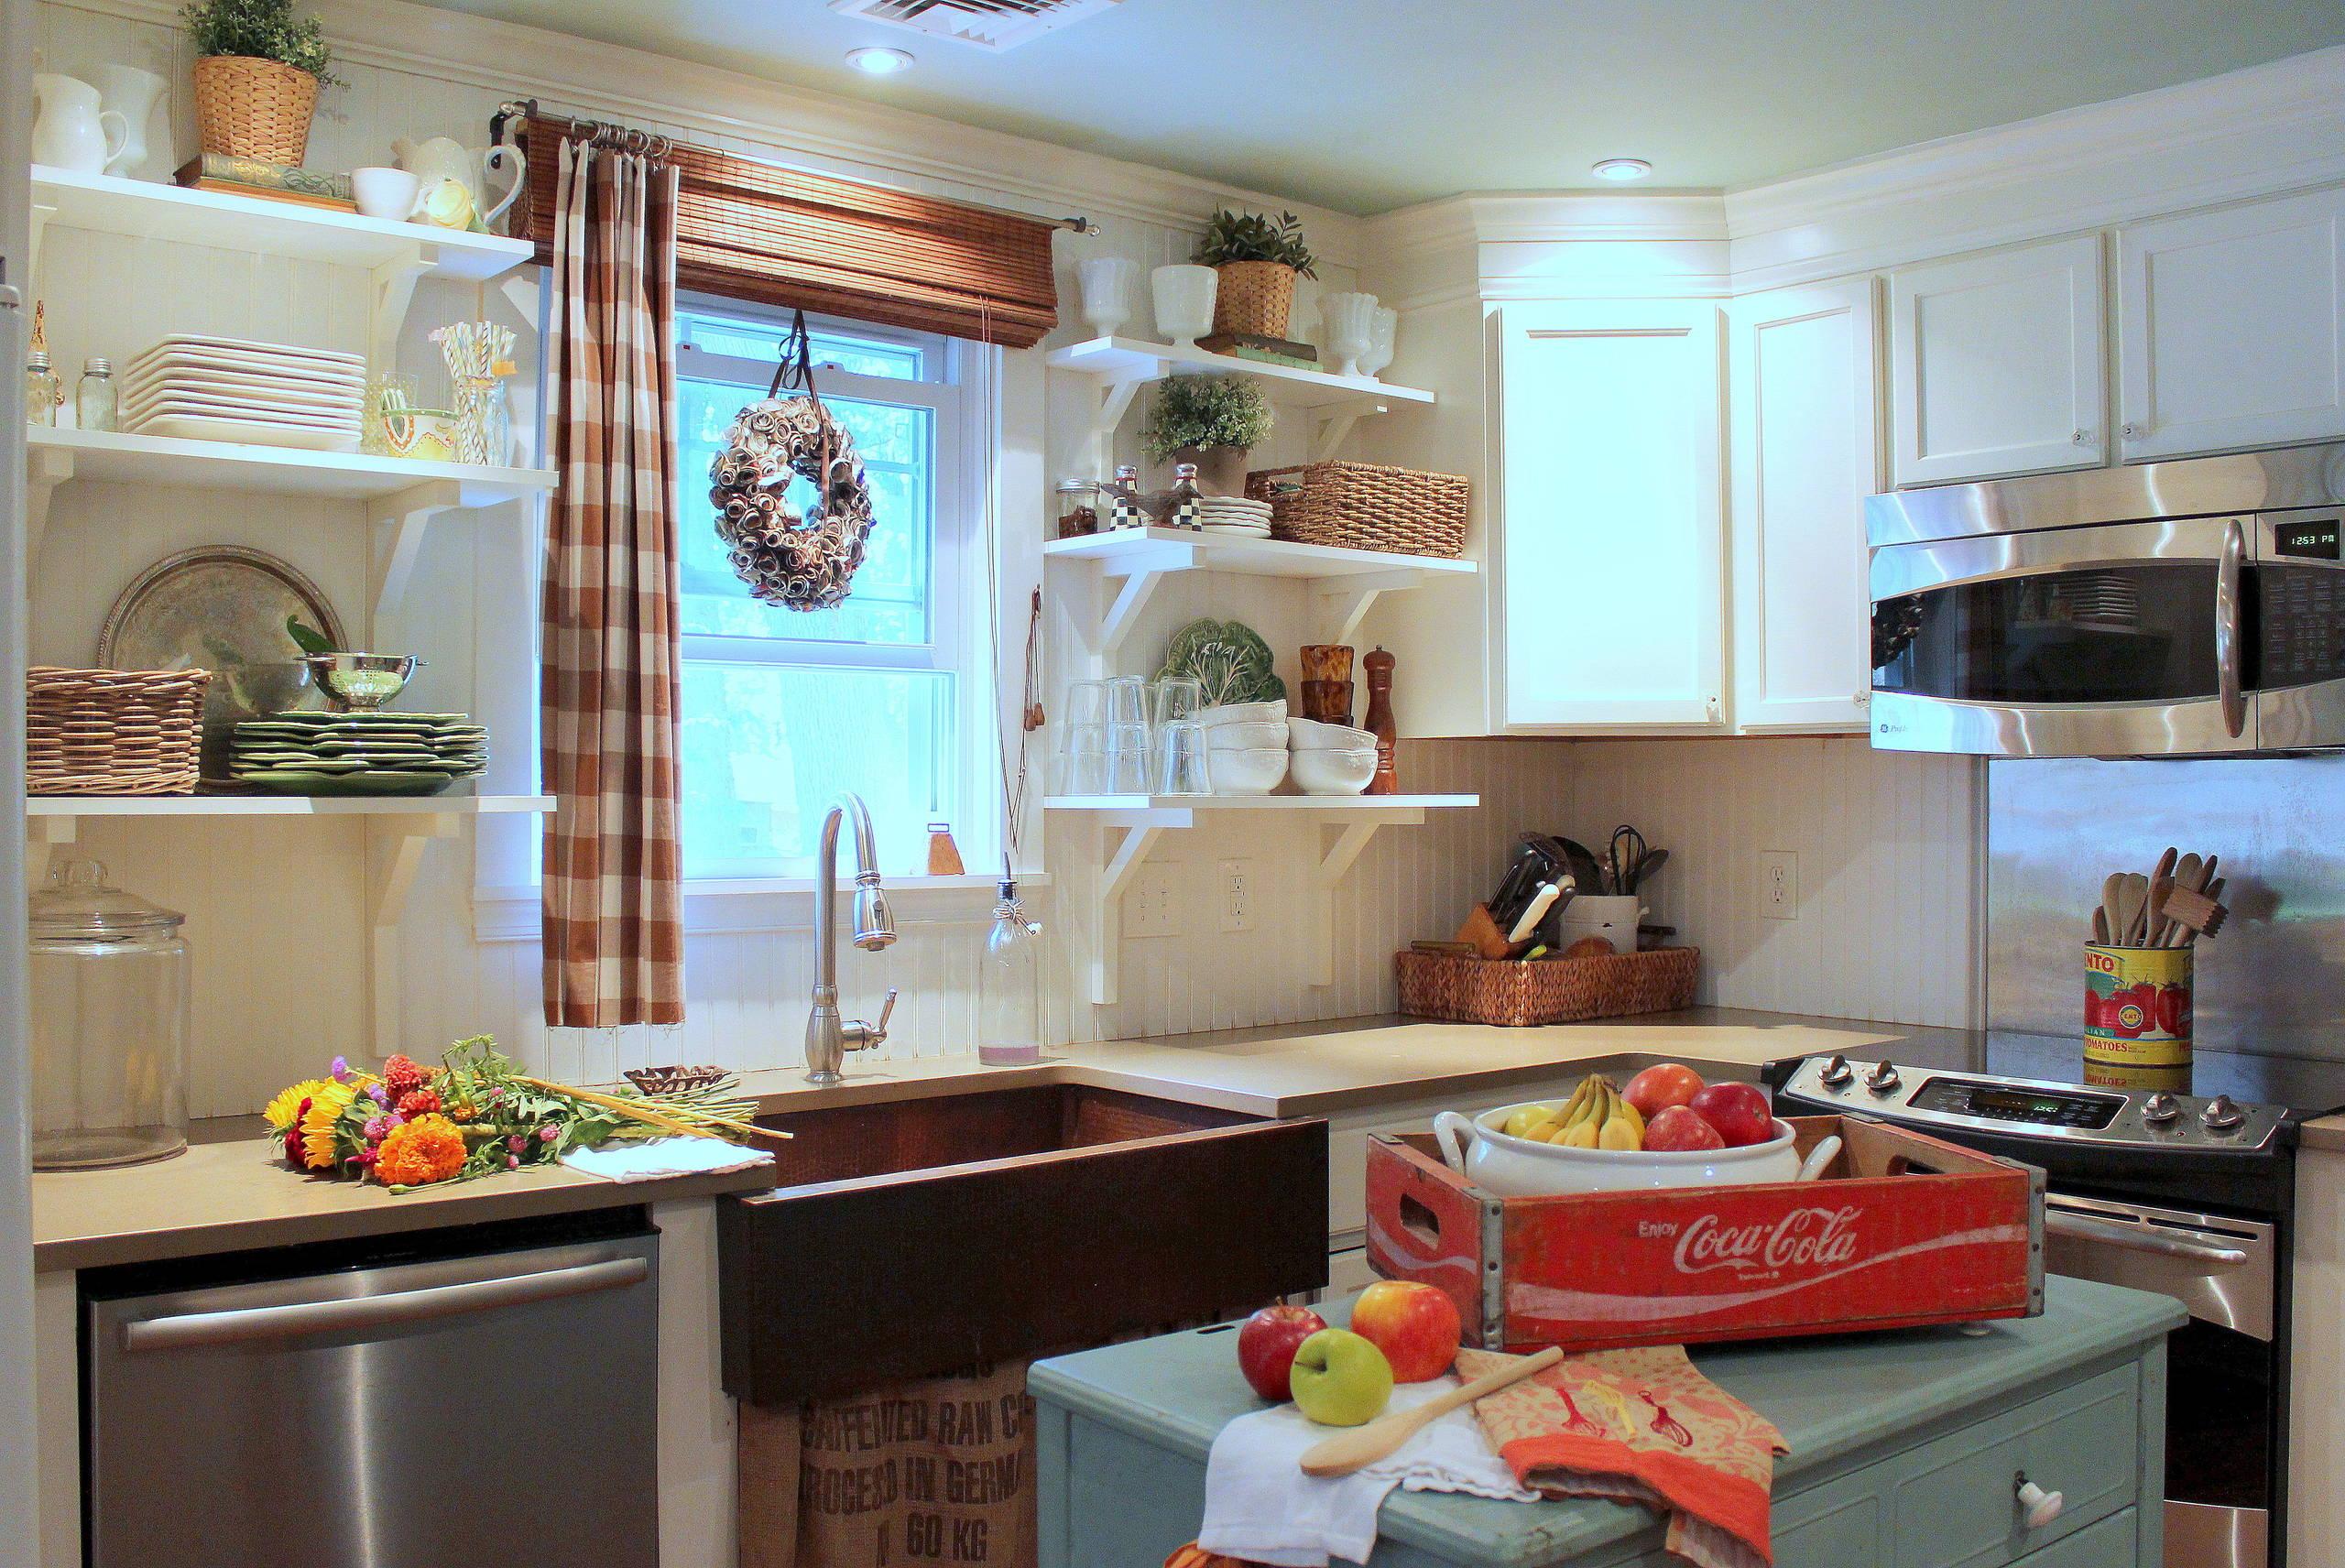 Coca Cola Kitchen Decor Houzz